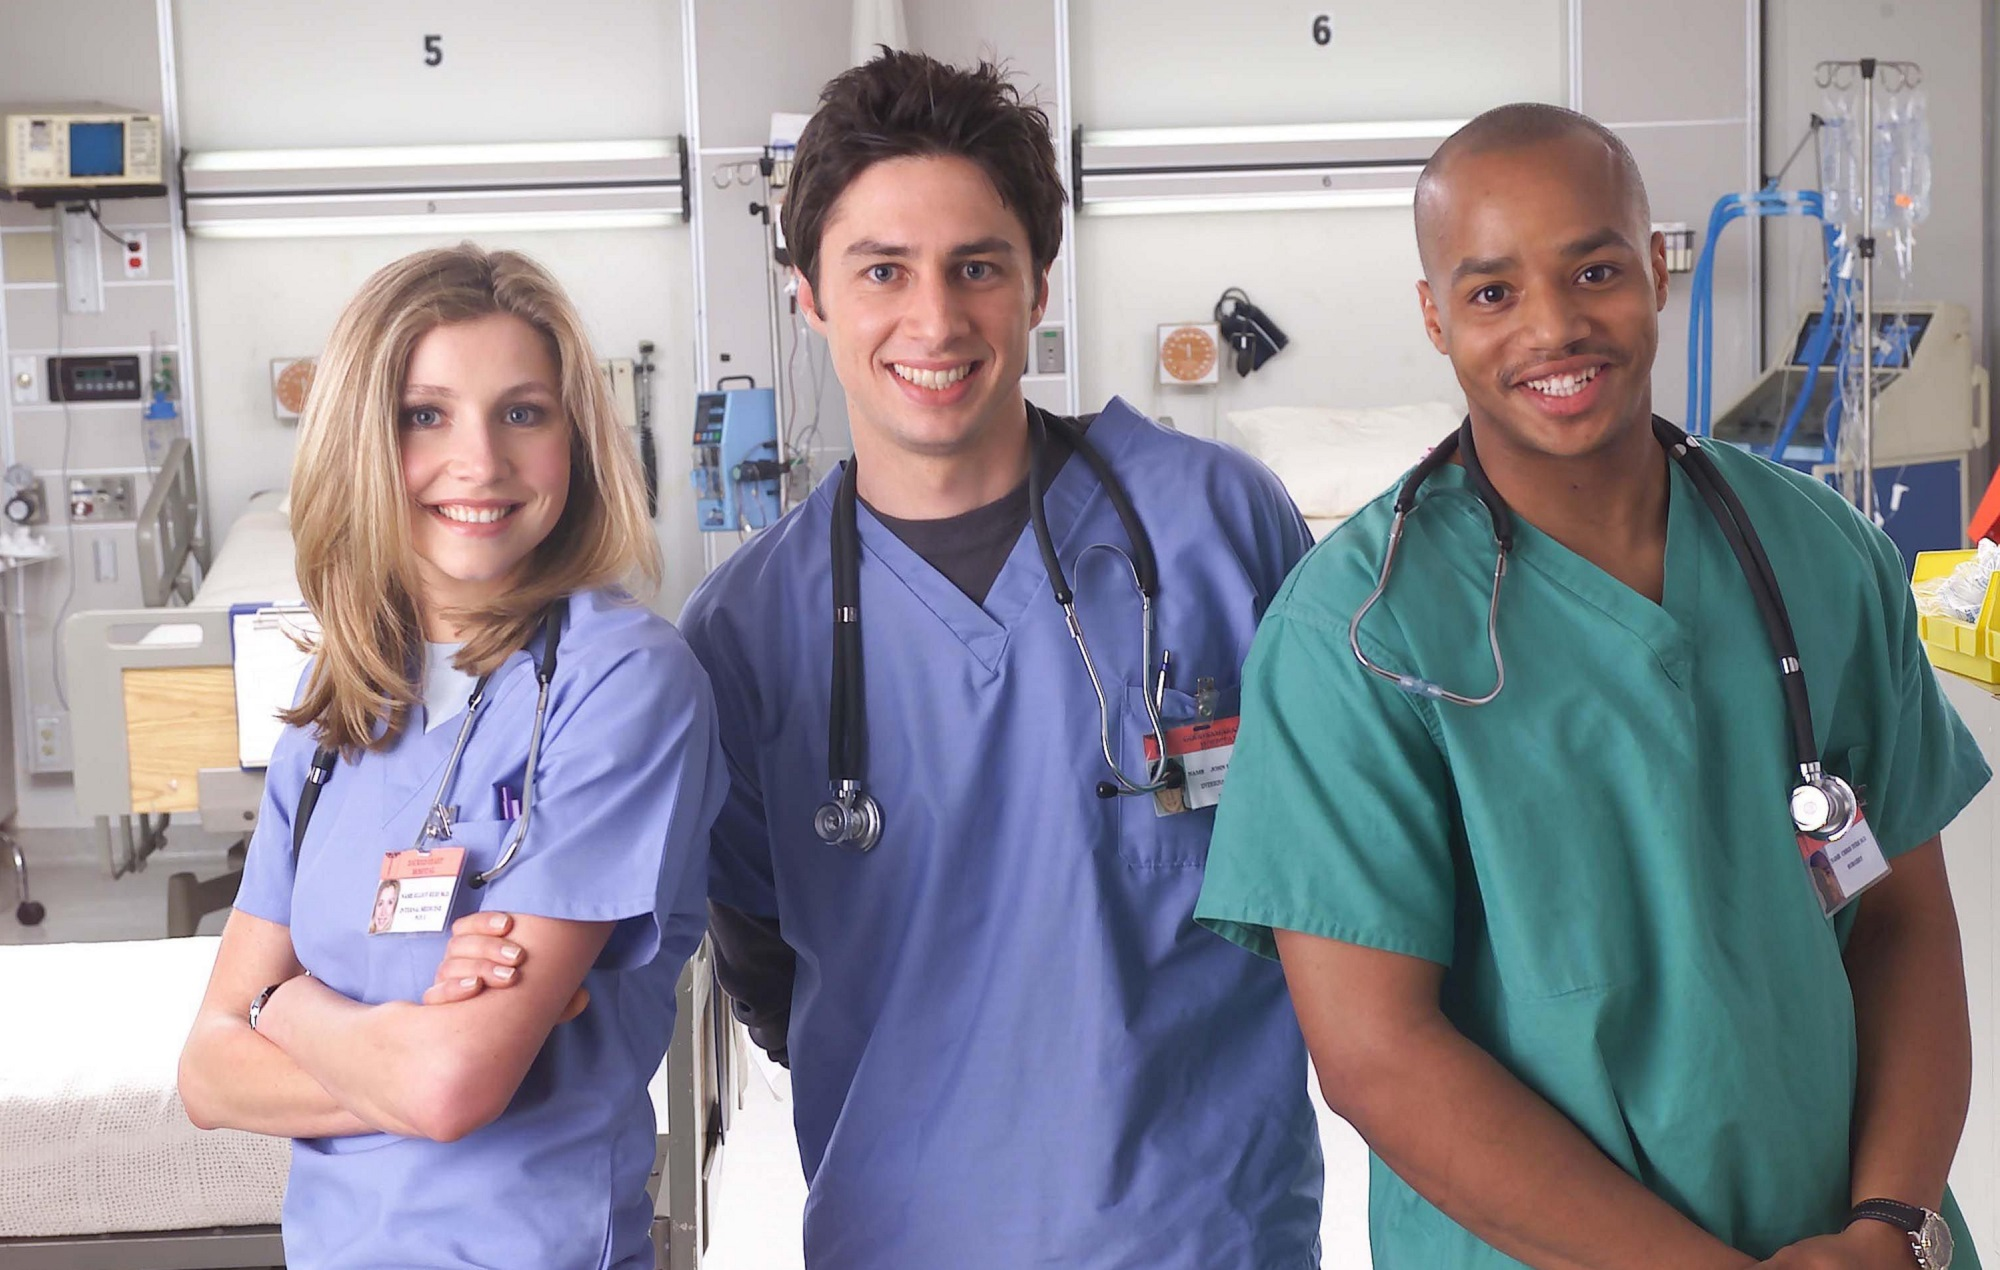 Zach Braff, Sarah Chalke and Donald Faison in Scrubs